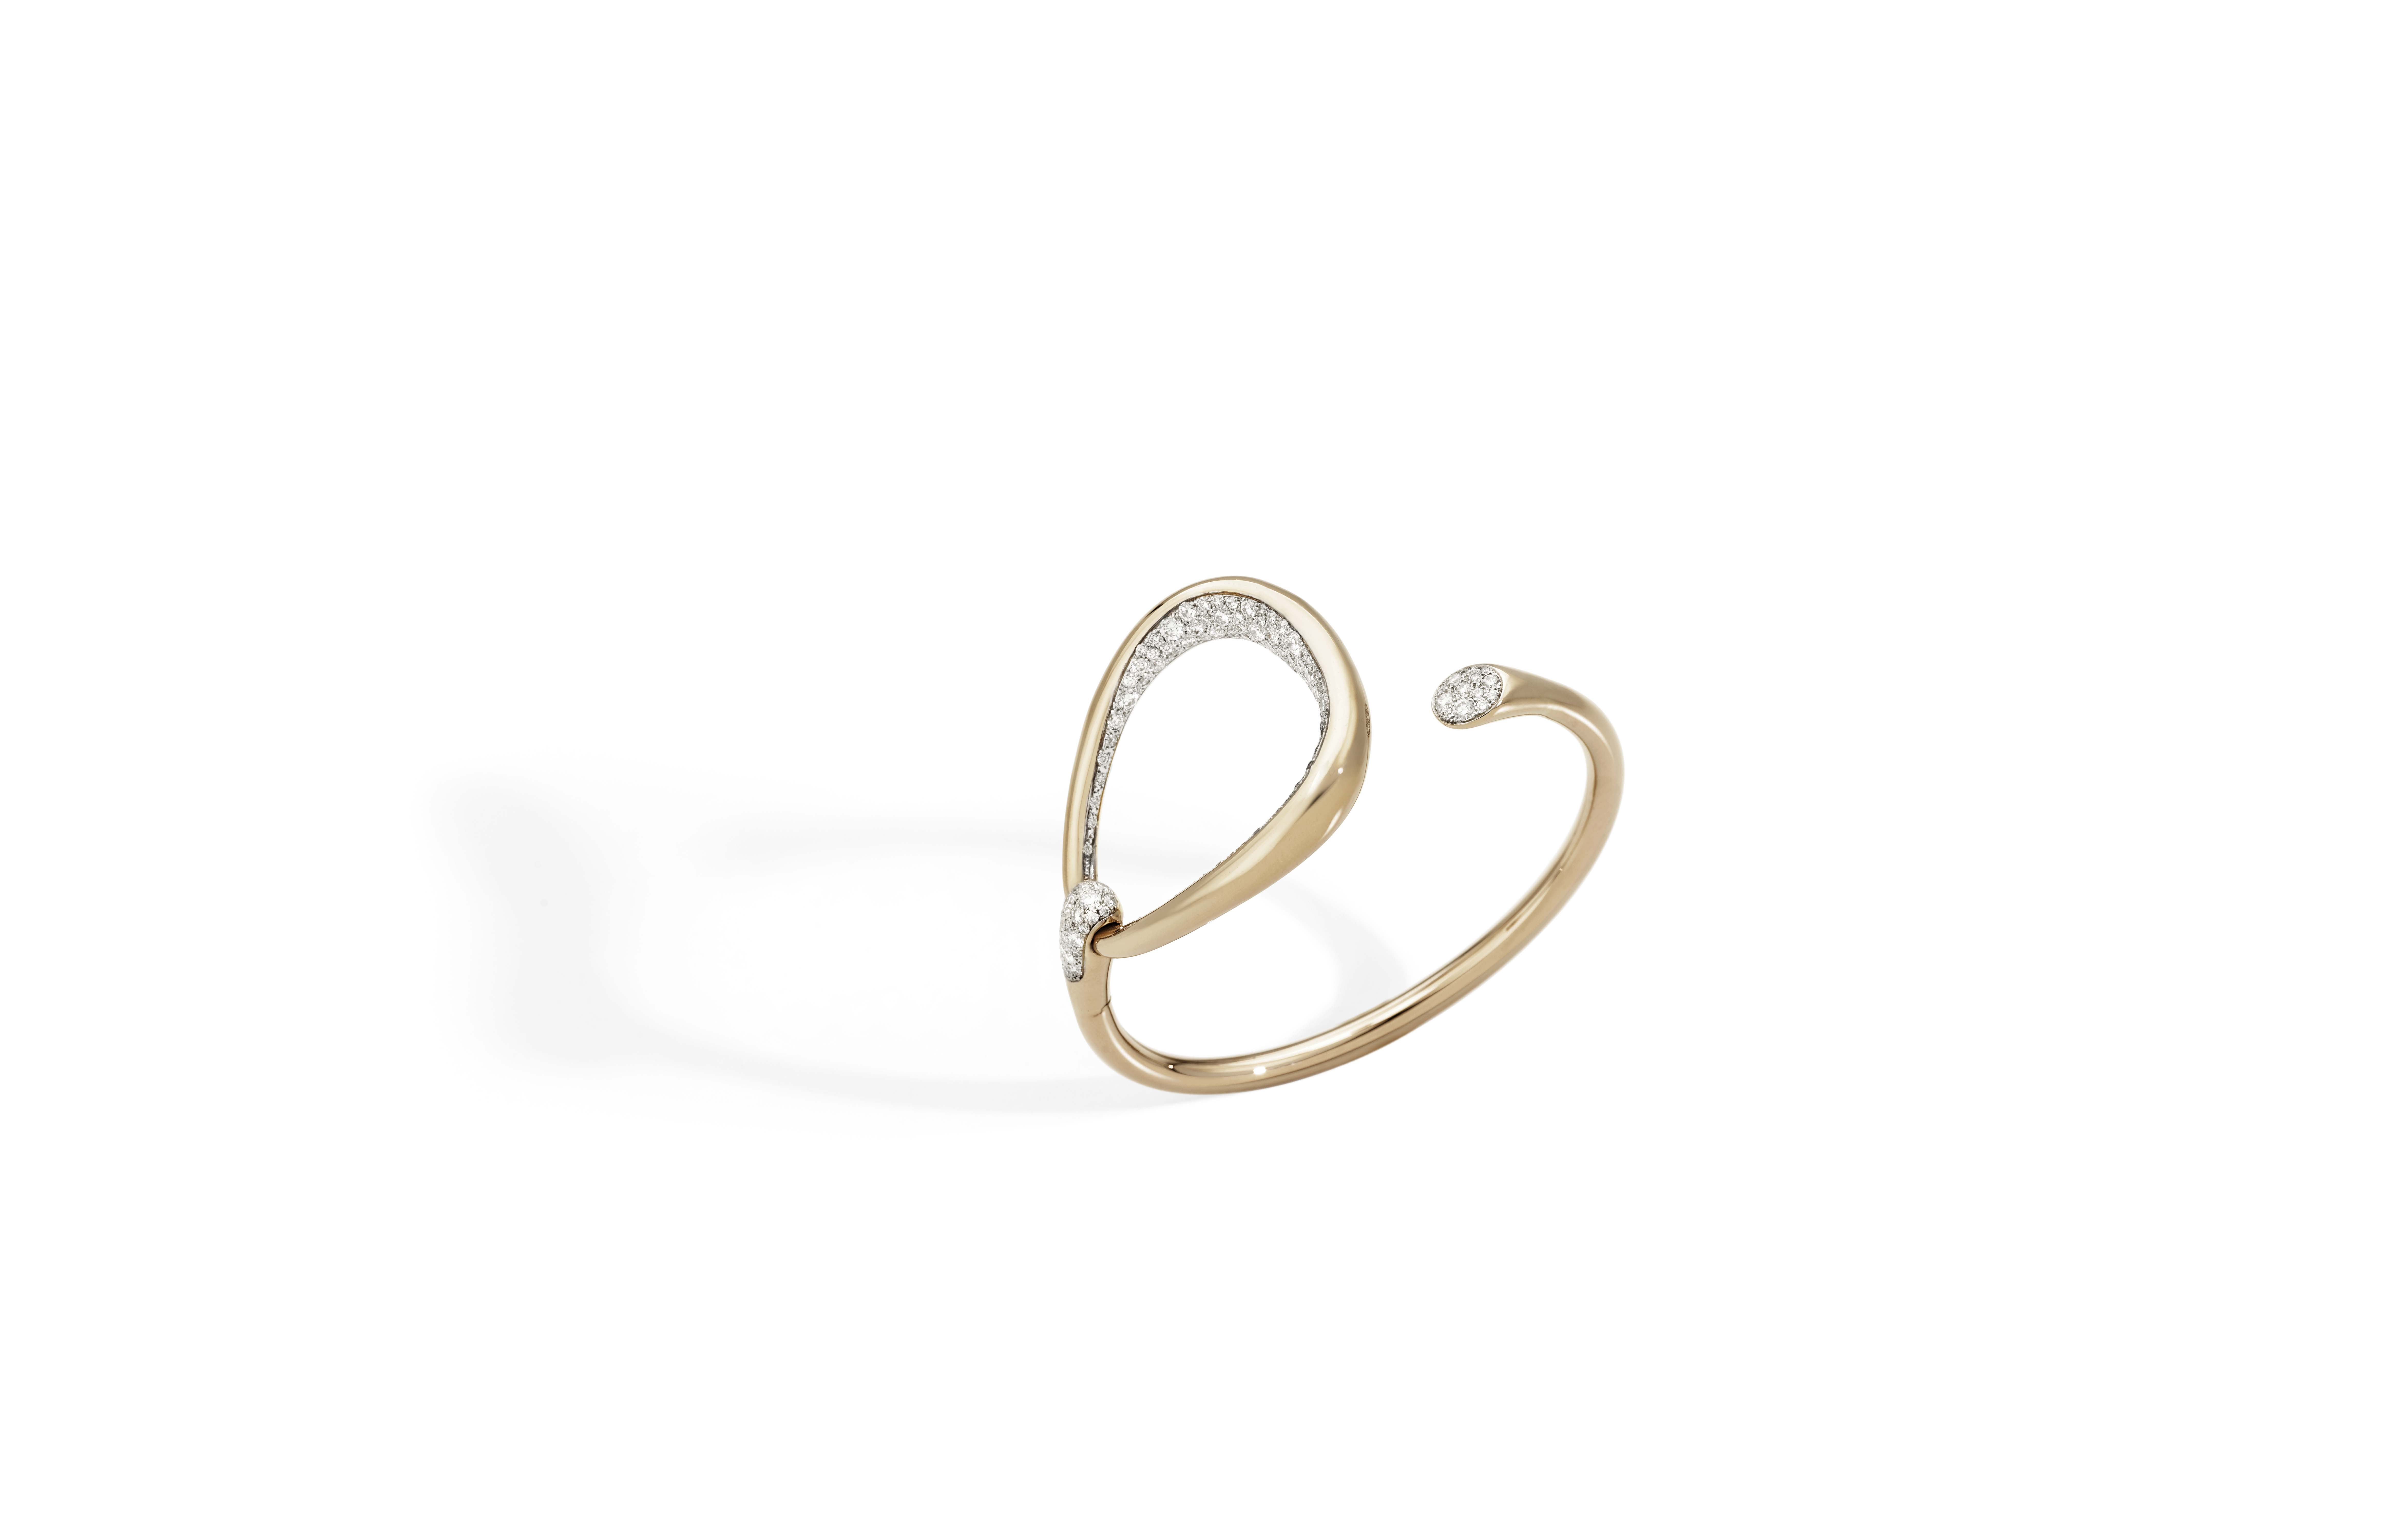 Bracelet en or rose et diamants.